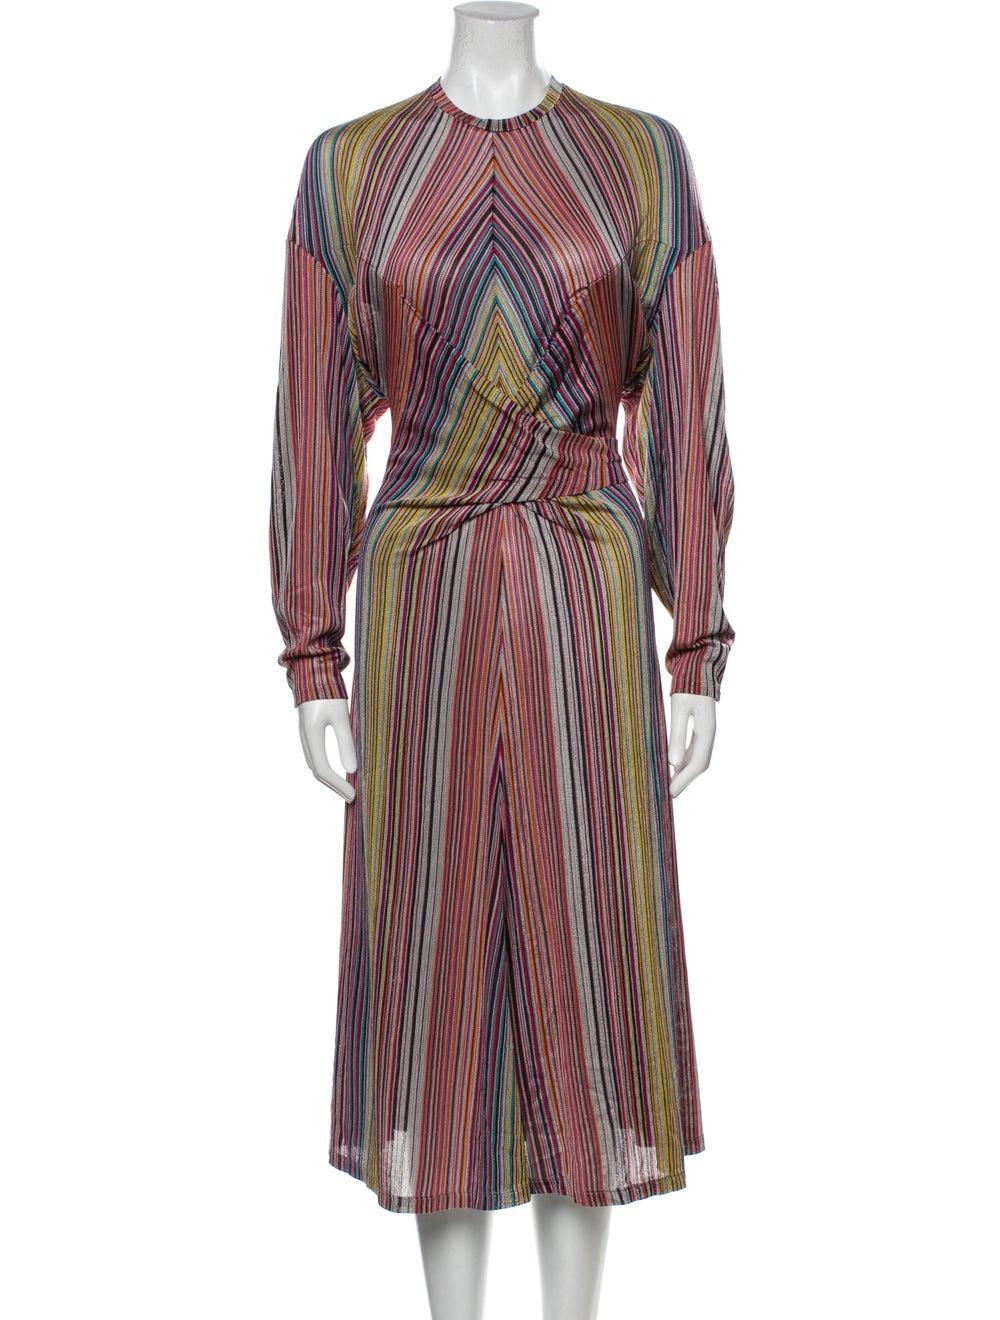 Beaufille Striped Midi Length Dress w/ Tags Orange - image 1